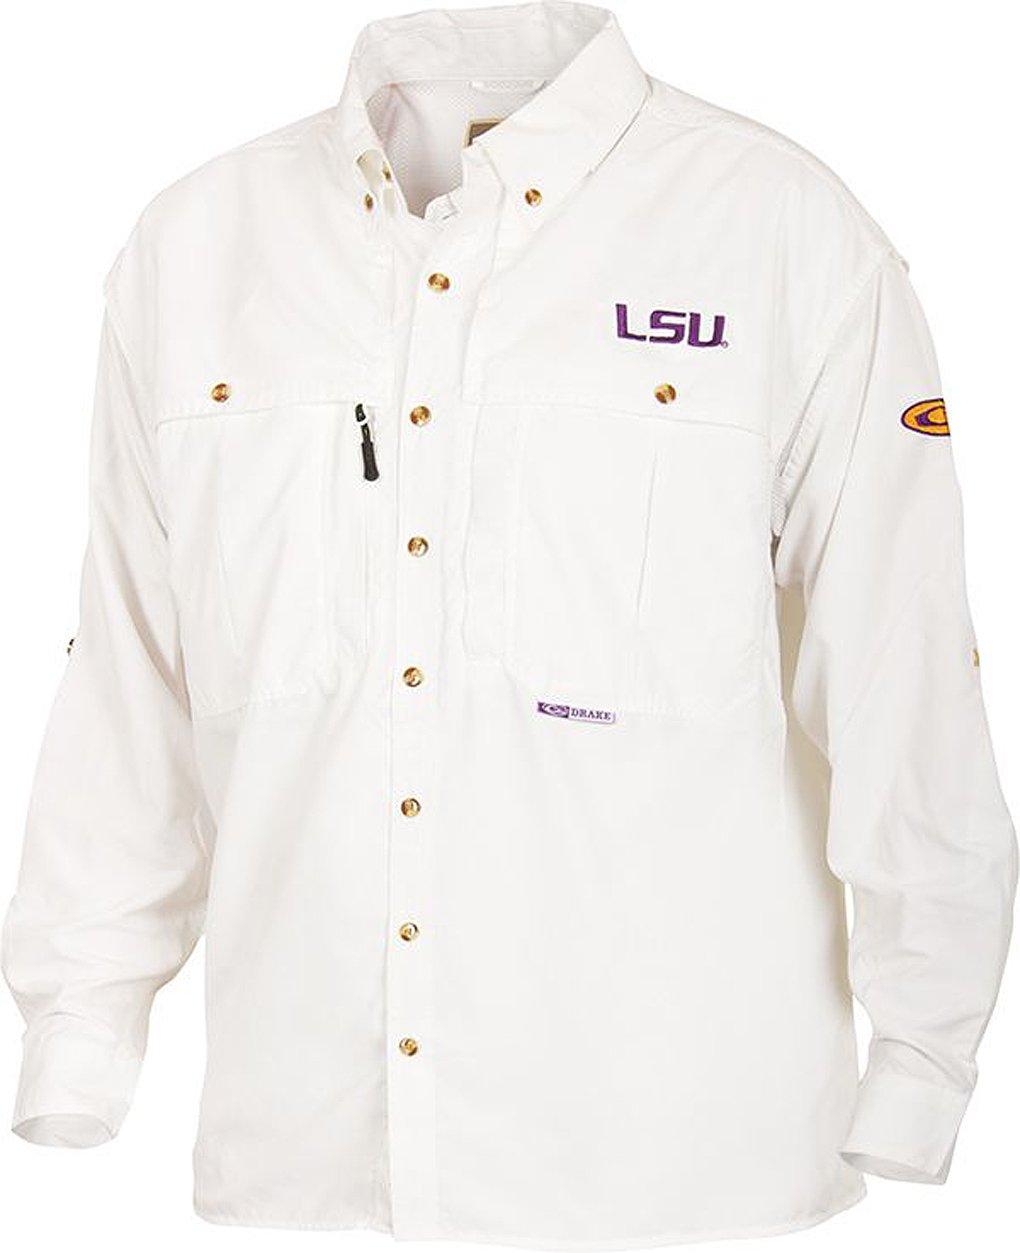 Amazon.com: Drake Men's LSU Long Sleeve Wingshooter Shirt: Sports & Outdoors